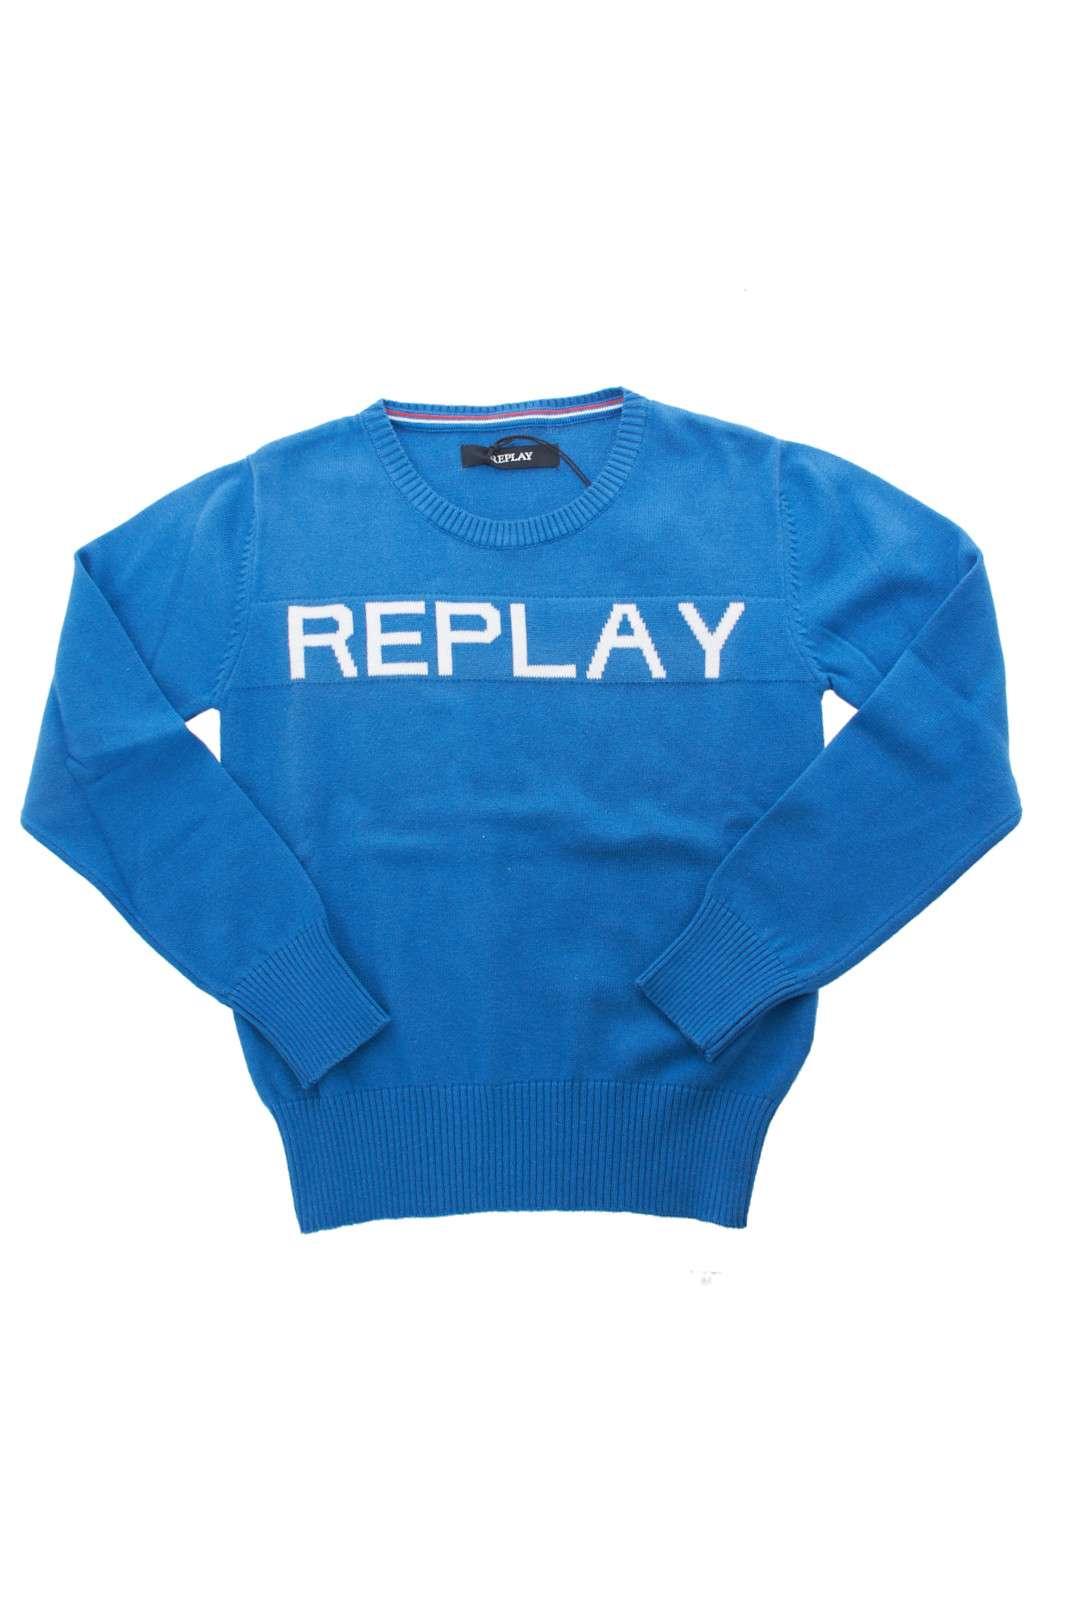 https://www.parmax.com/media/catalog/product/a/i/PE-outlet_parmax-maglia-bambino-Relplay-G21280-A.jpg